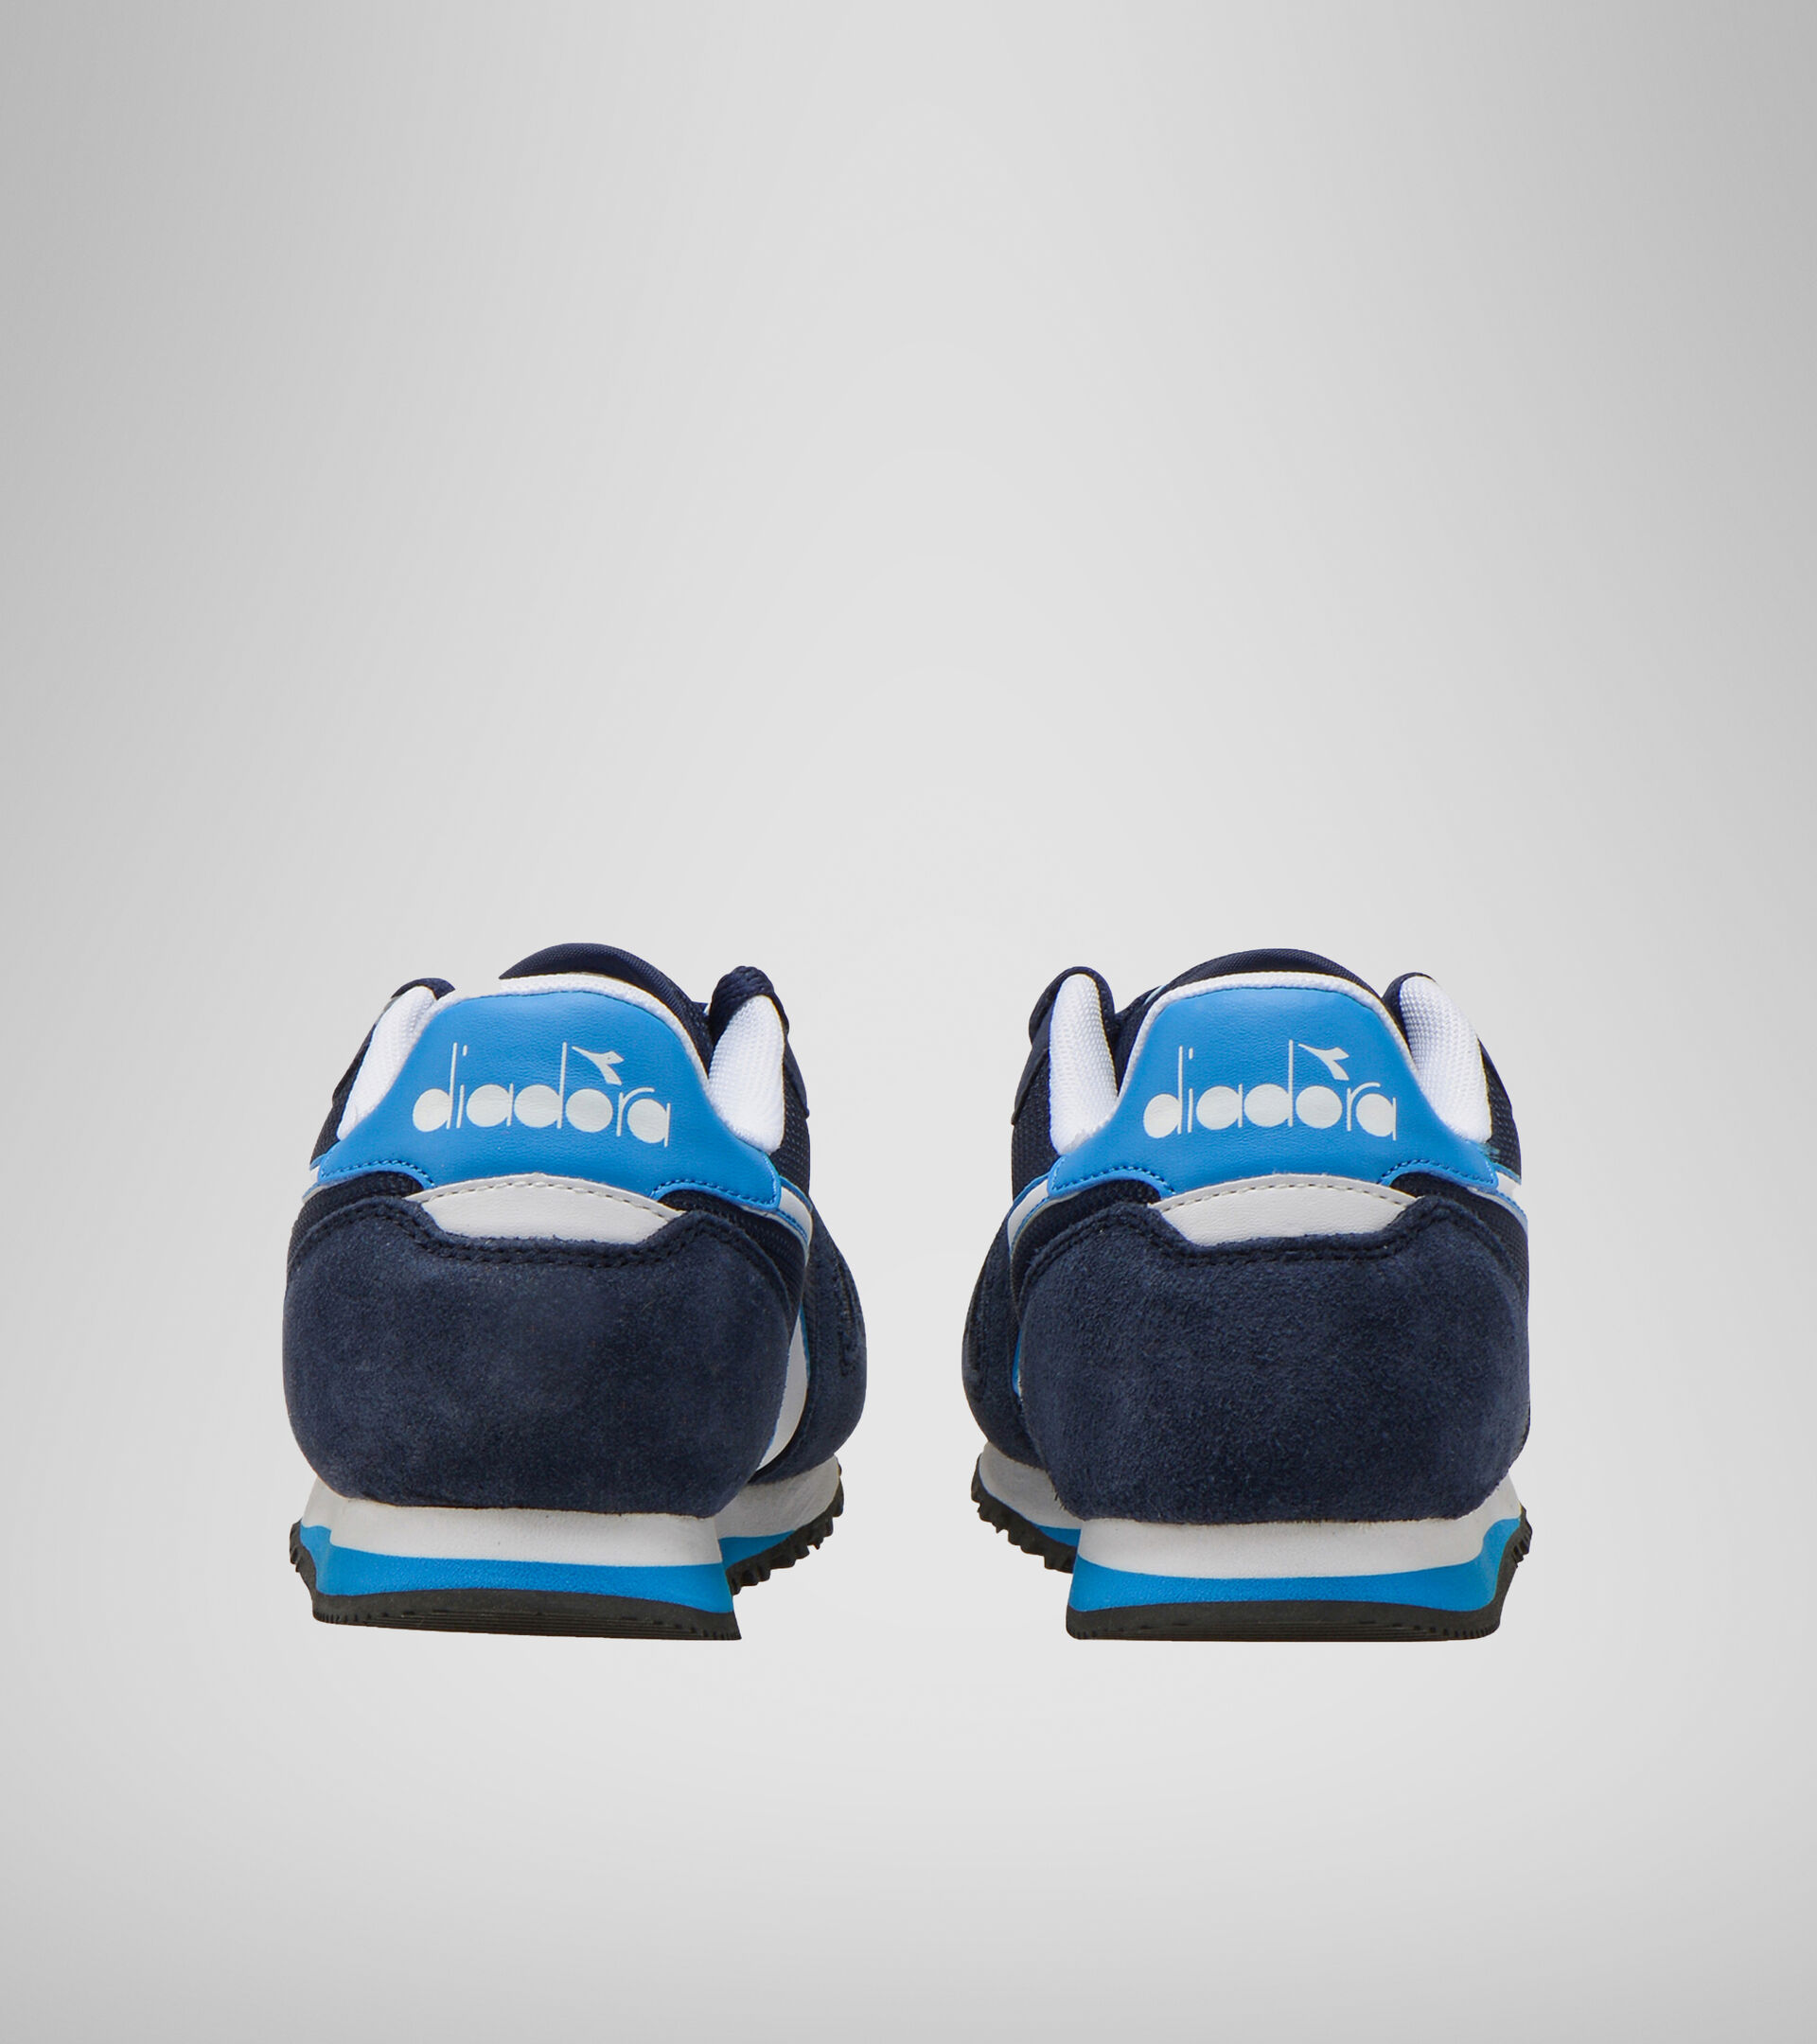 Footwear Sport BAMBINO SIMPLE RUN GS BLU CORSARO/AZZURRO ALLEGRO Diadora